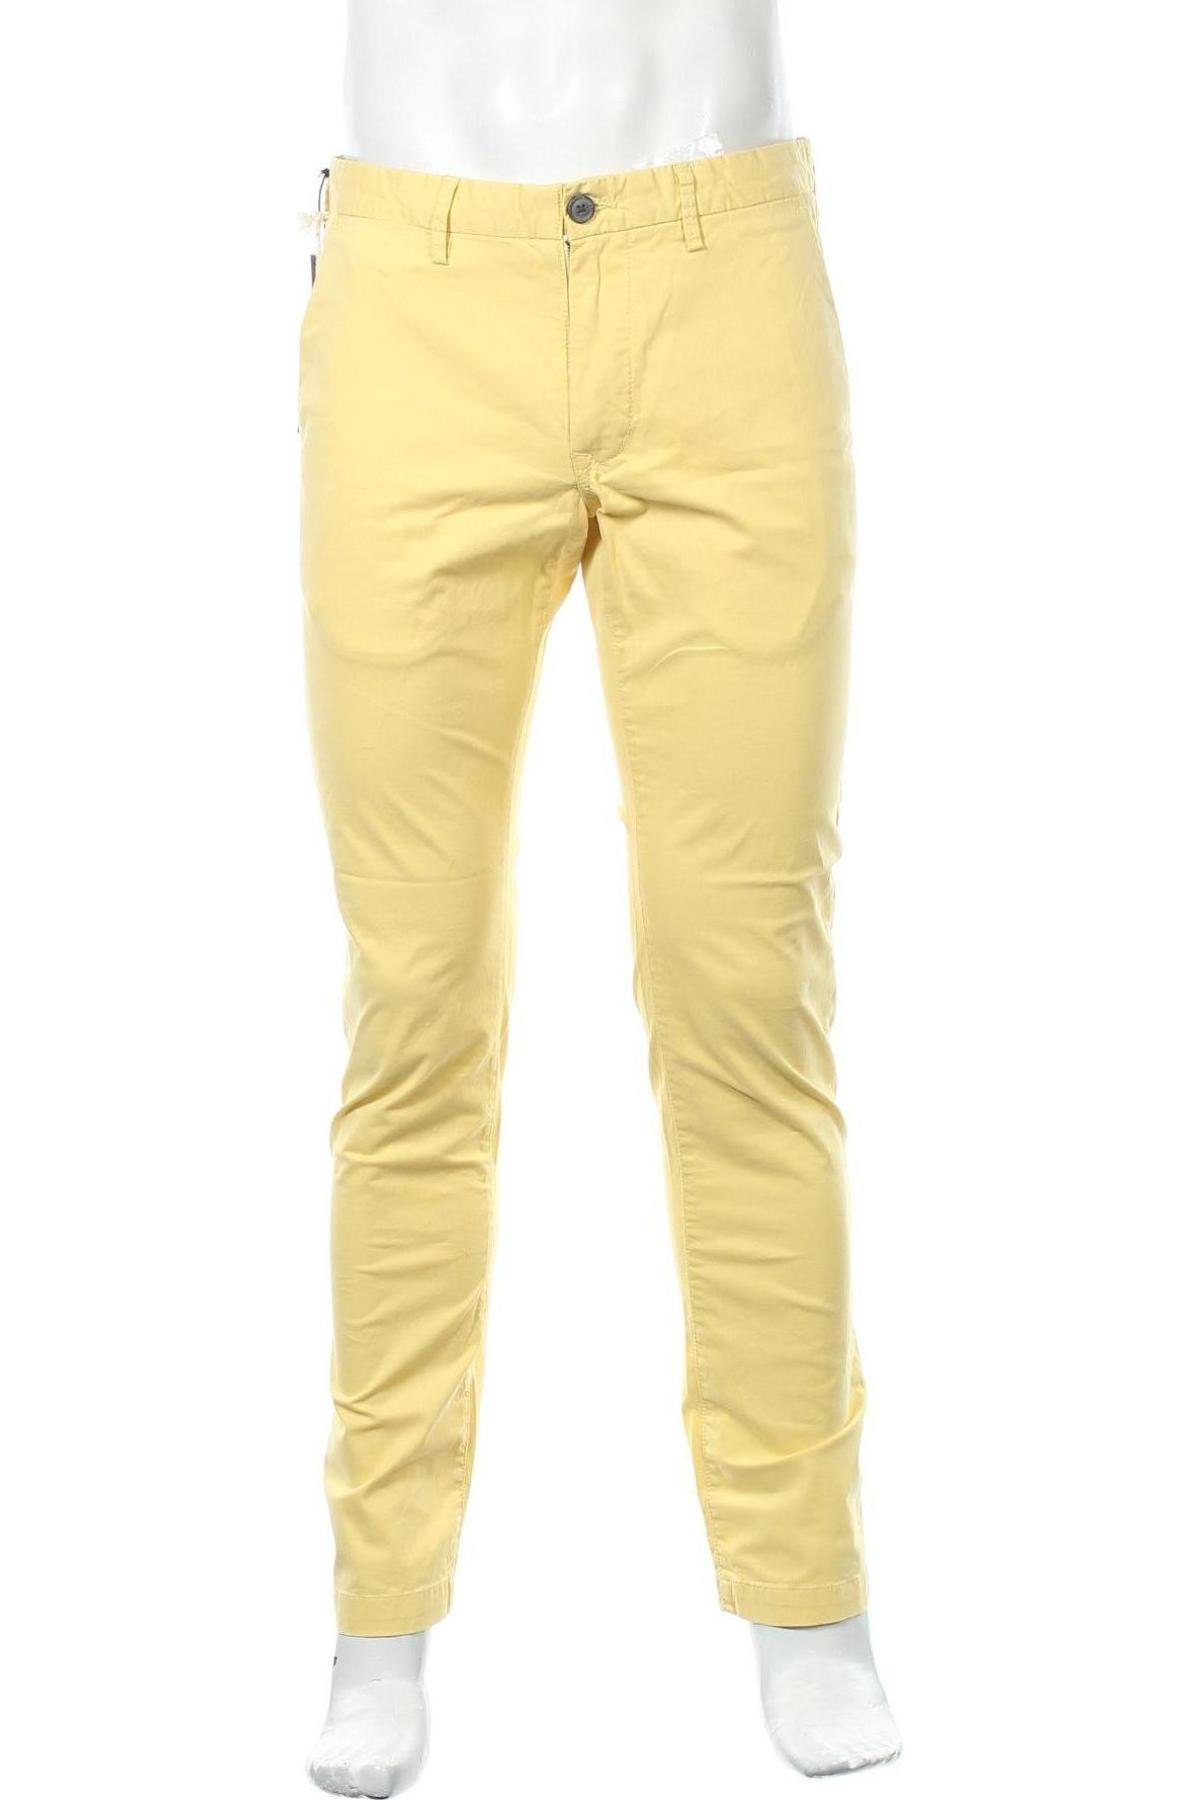 Мъжки панталон Teddy Smith, Размер M, Цвят Бежов, 97% памук, 3% еластан, Цена 66,75лв.